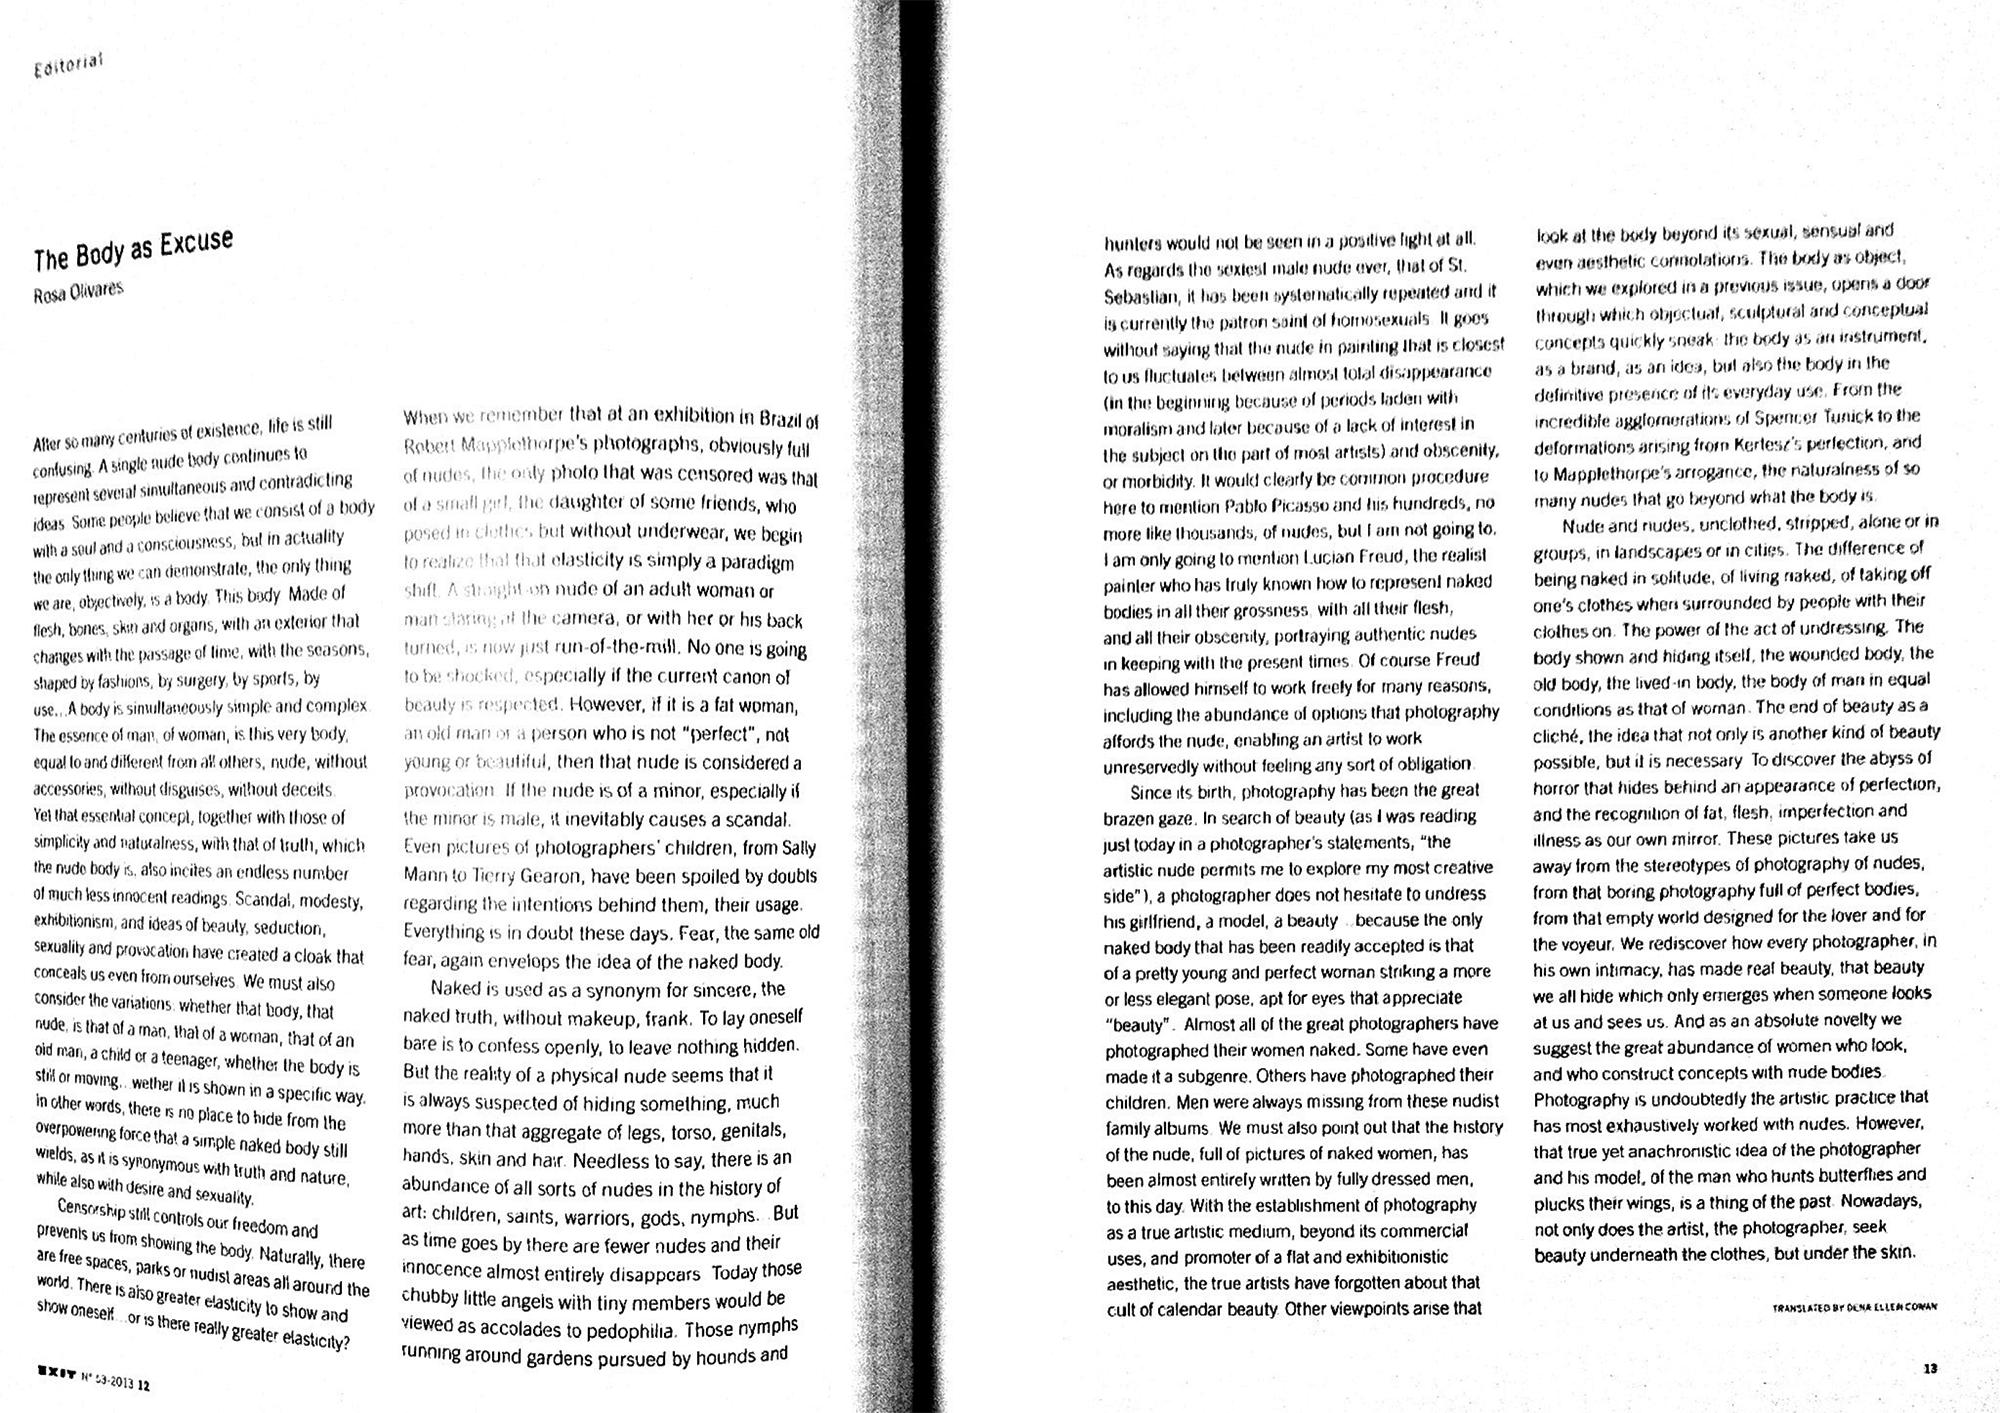 exit-magazine-april-2014-essay-by-rose-olivares.jpg